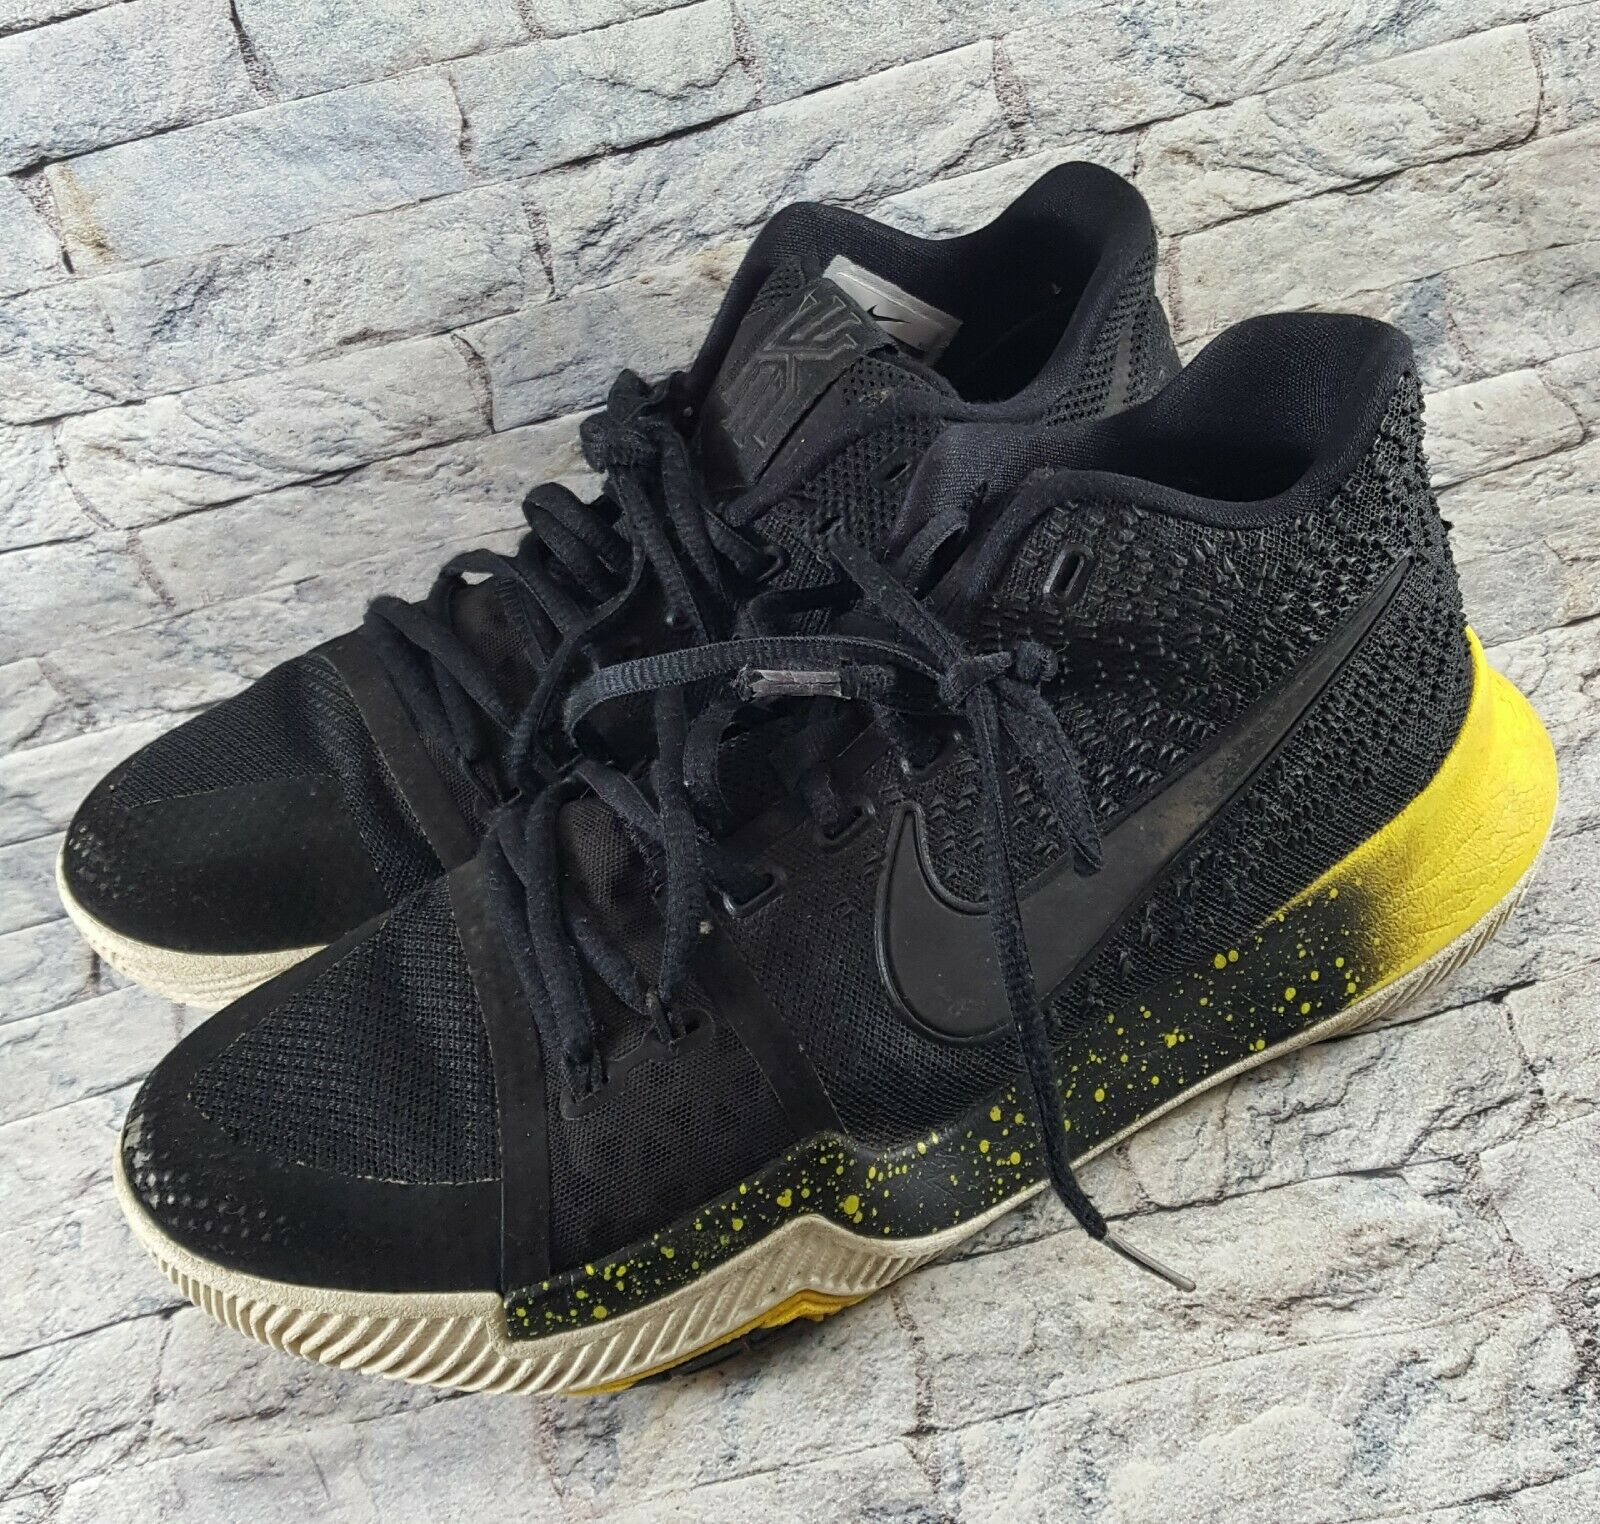 Nike Kyrie 3 Black Yellow White Mamba Mentality Bruce Lee 852395-901 shoes Sz 8